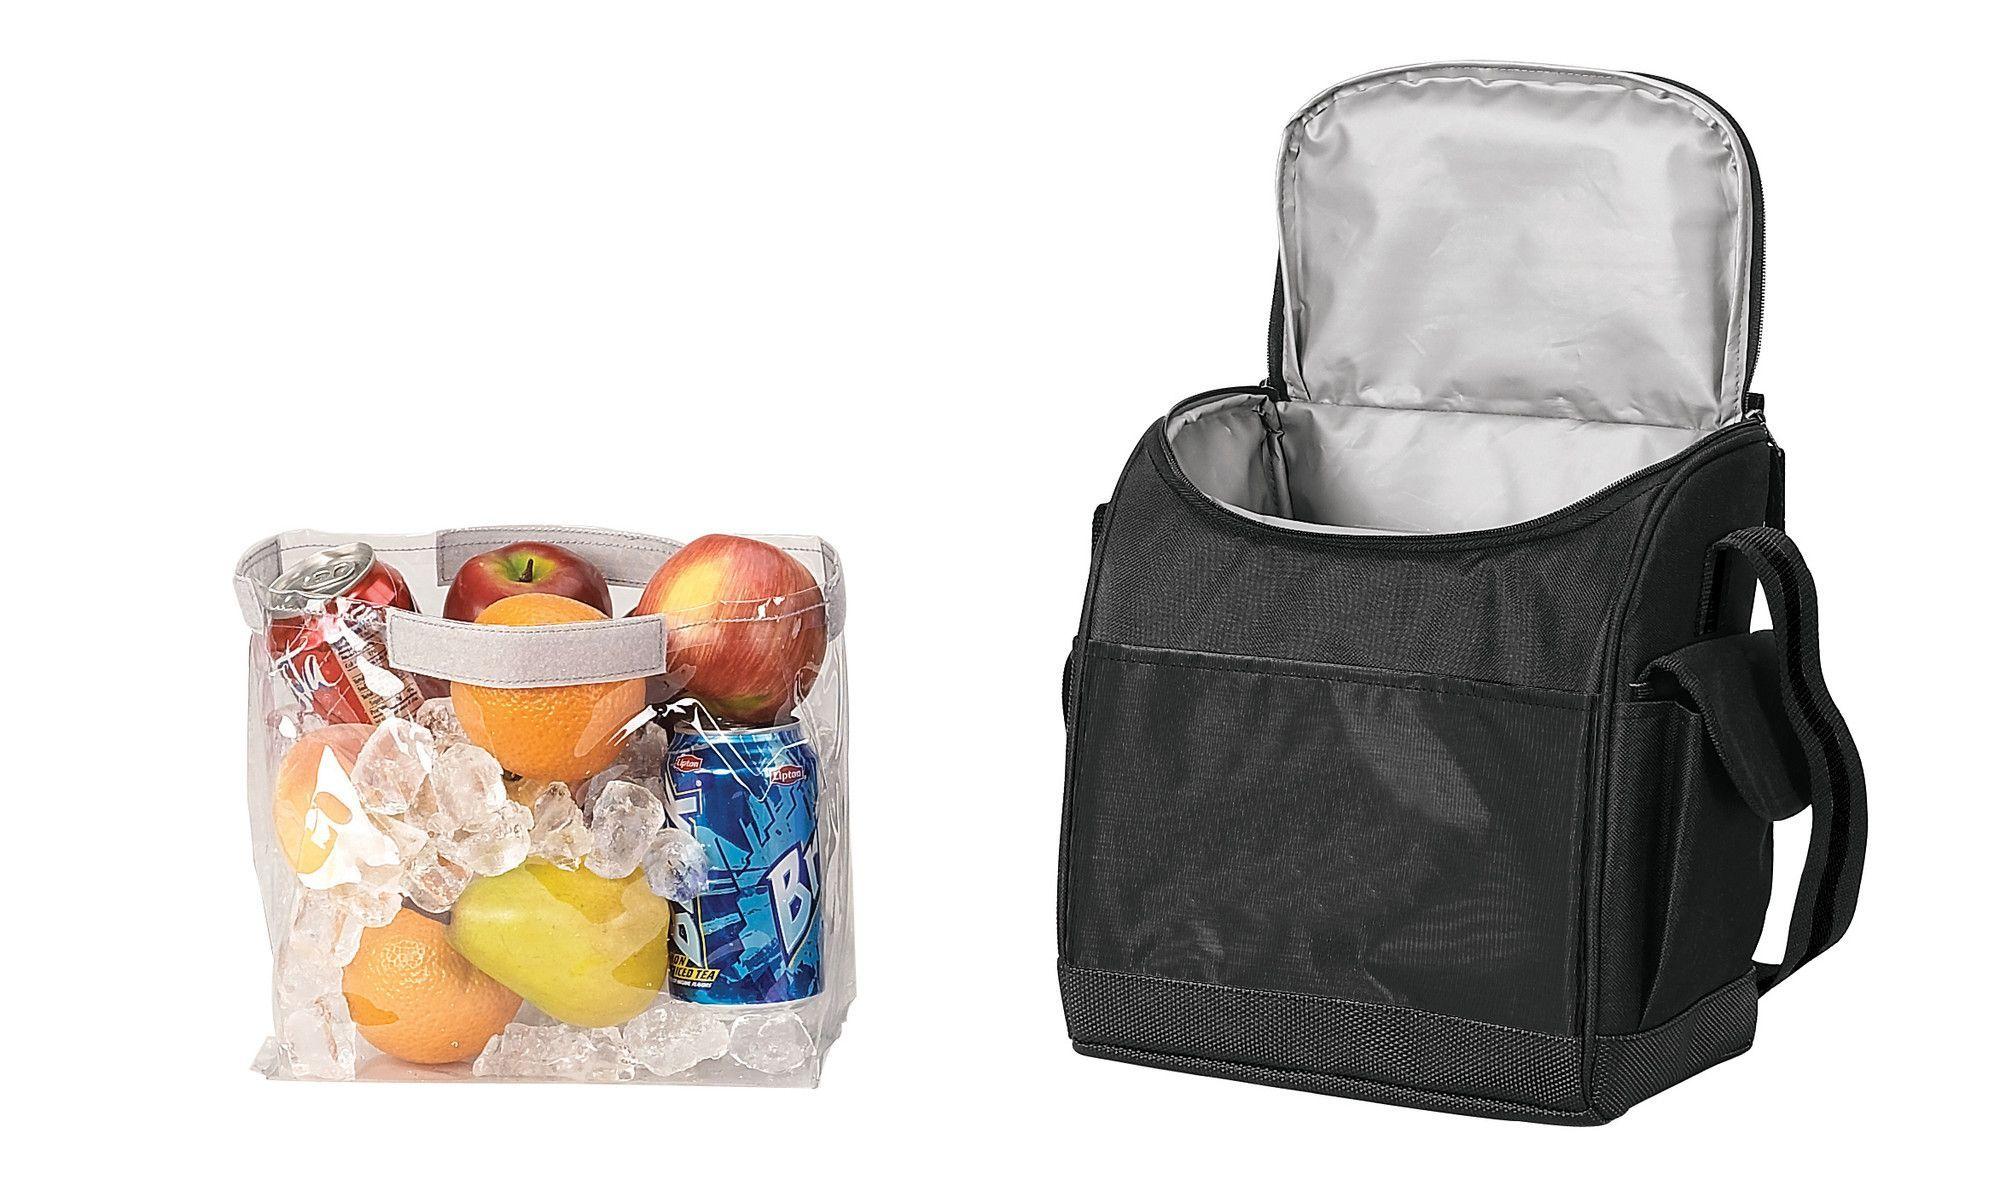 12 Can Travelwell The Hatchback Cooler (Set of 2)